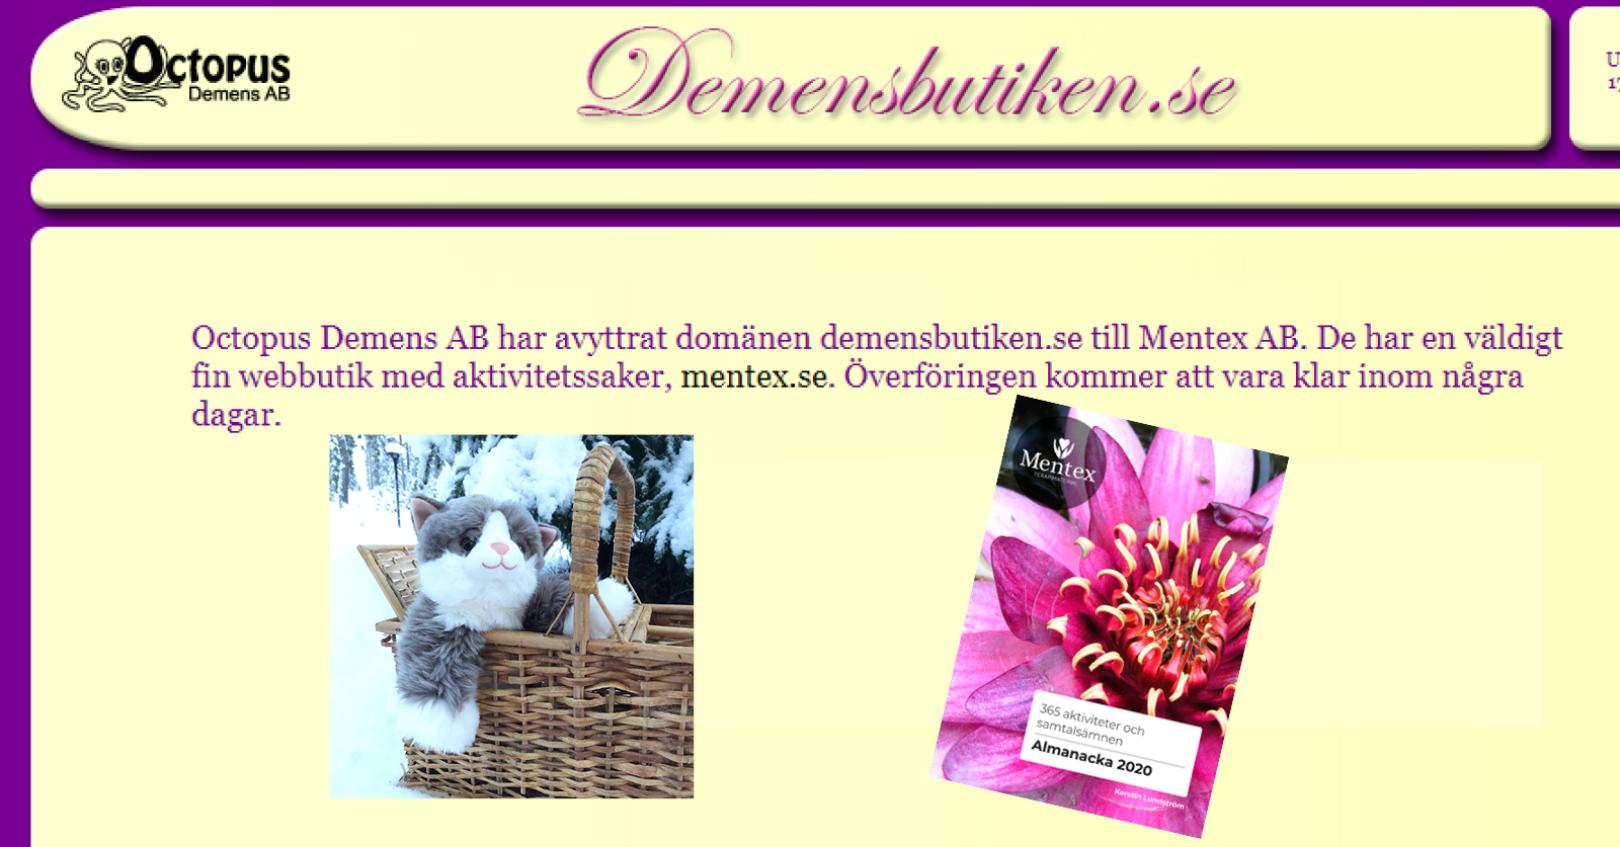 Mentex demensbutiken.se